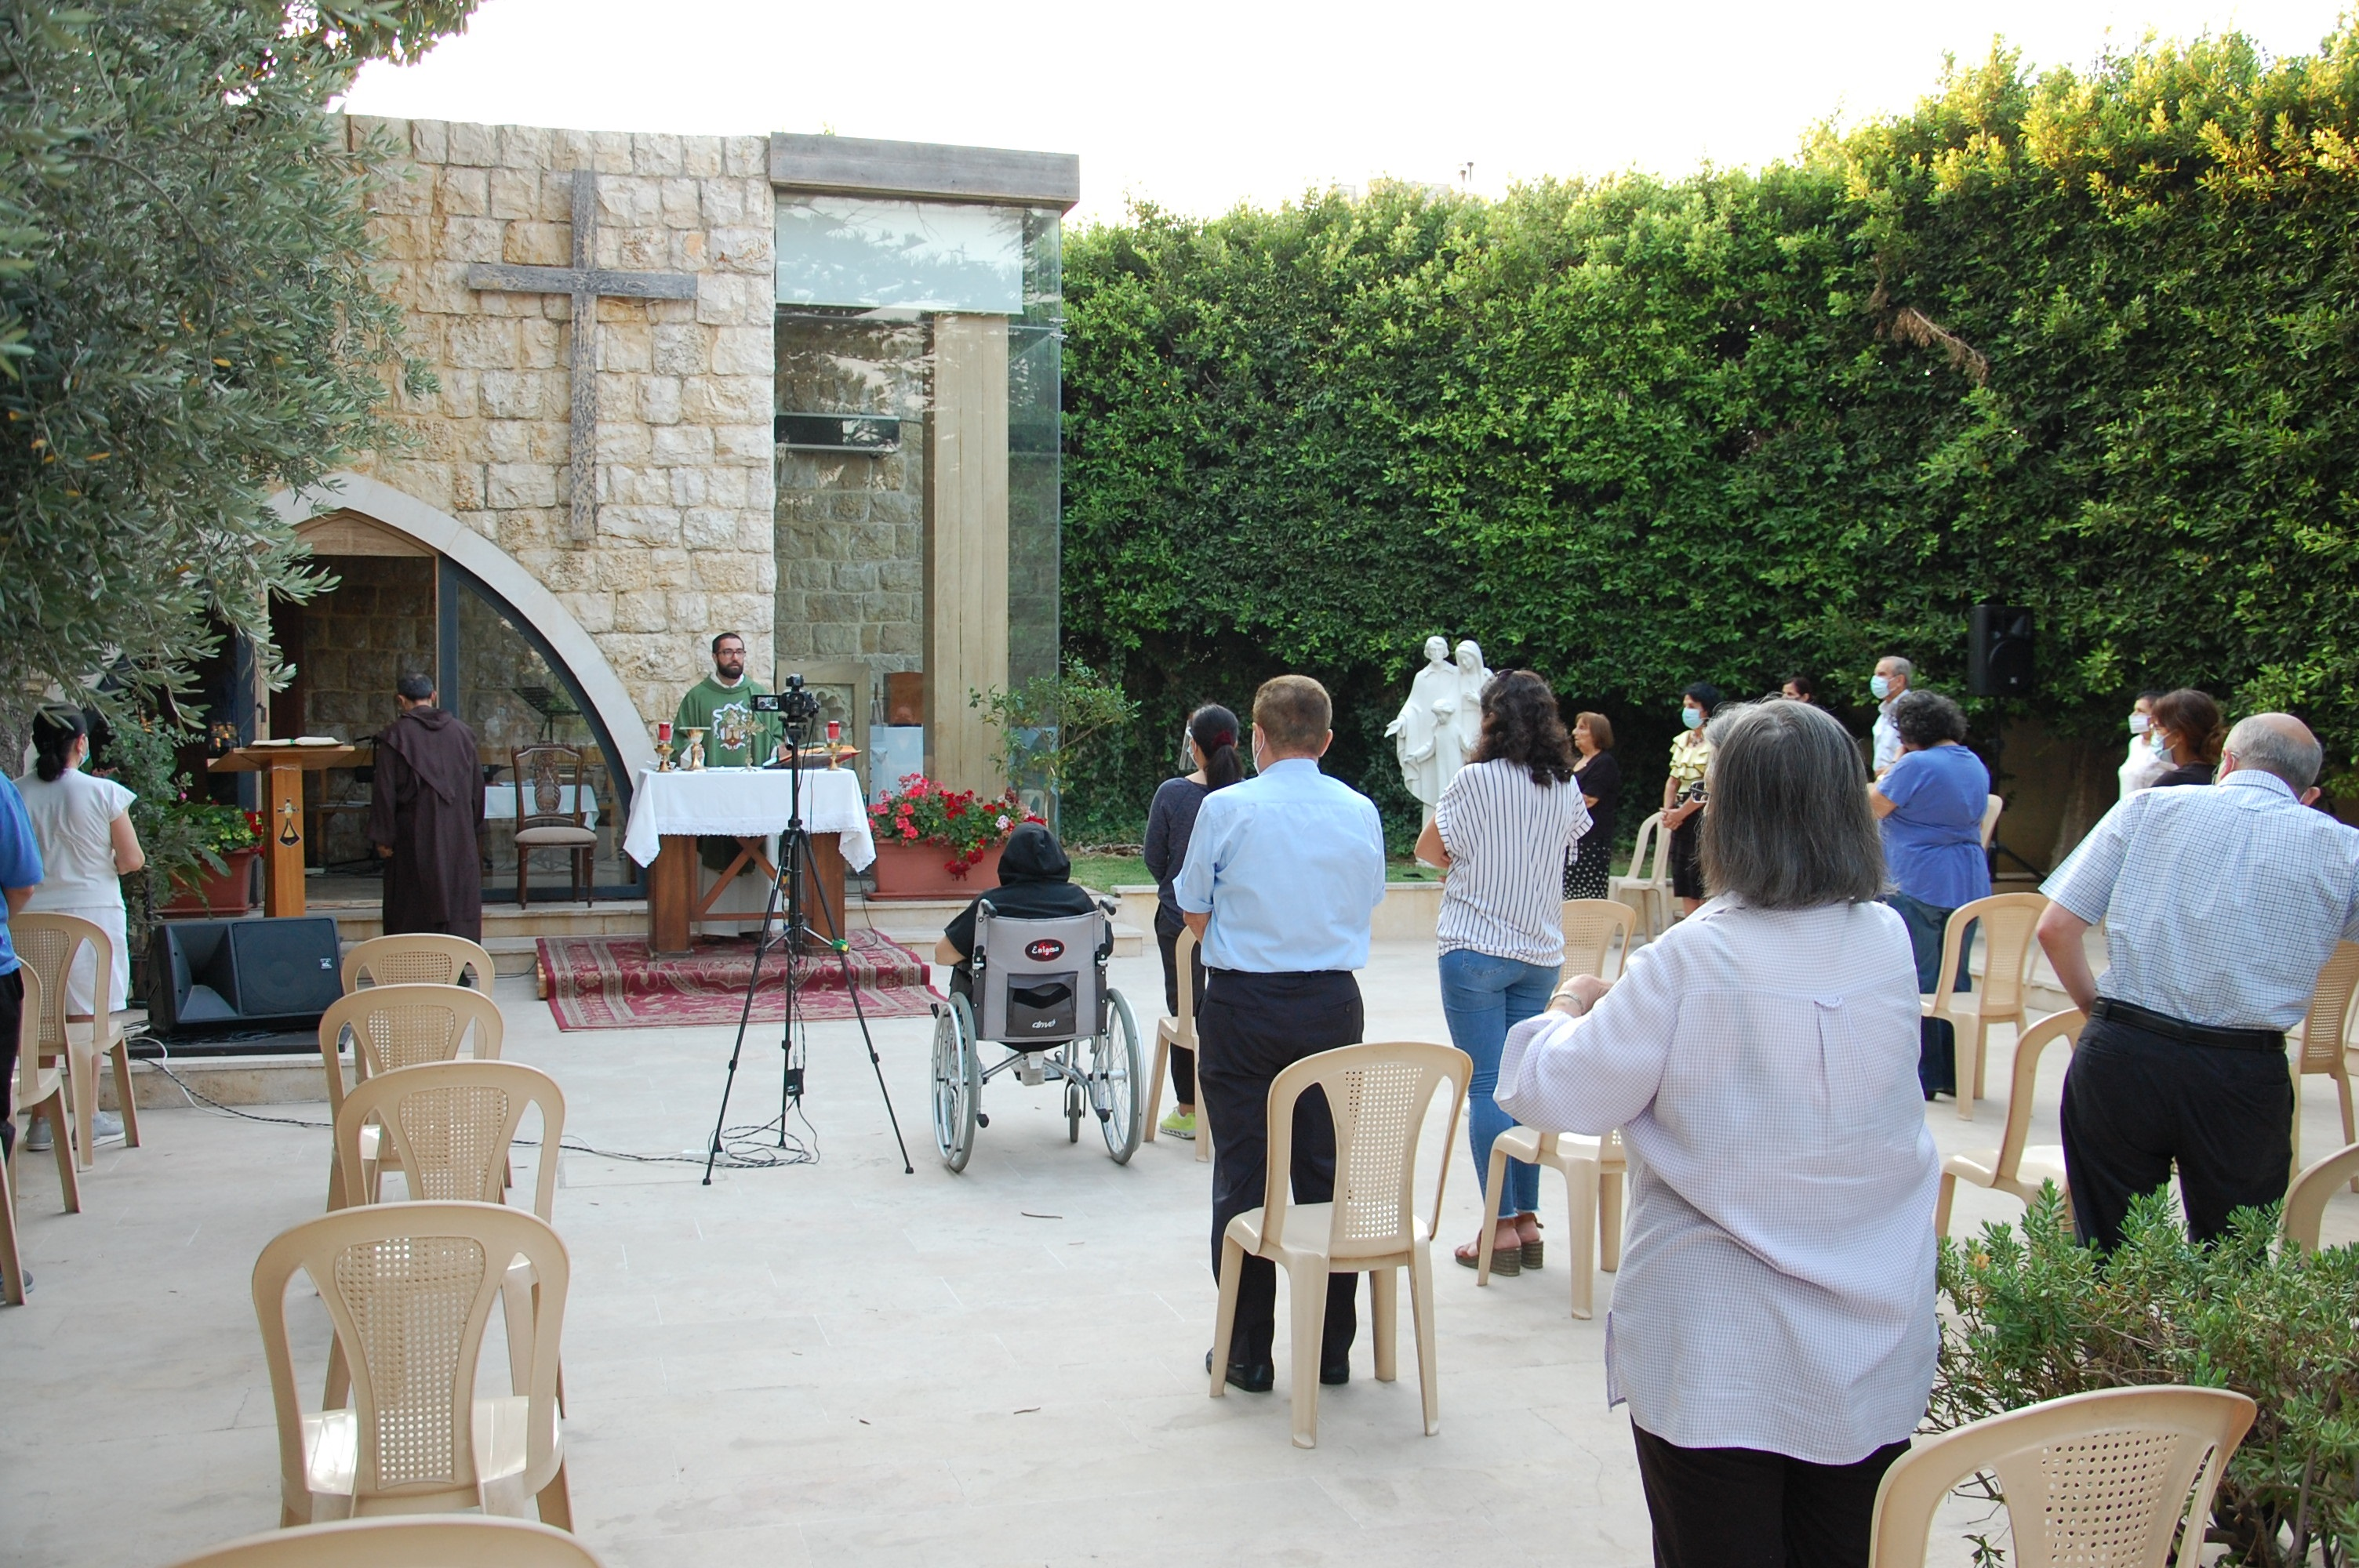 Lebanon – the Carmelite monastery in Hazmieh